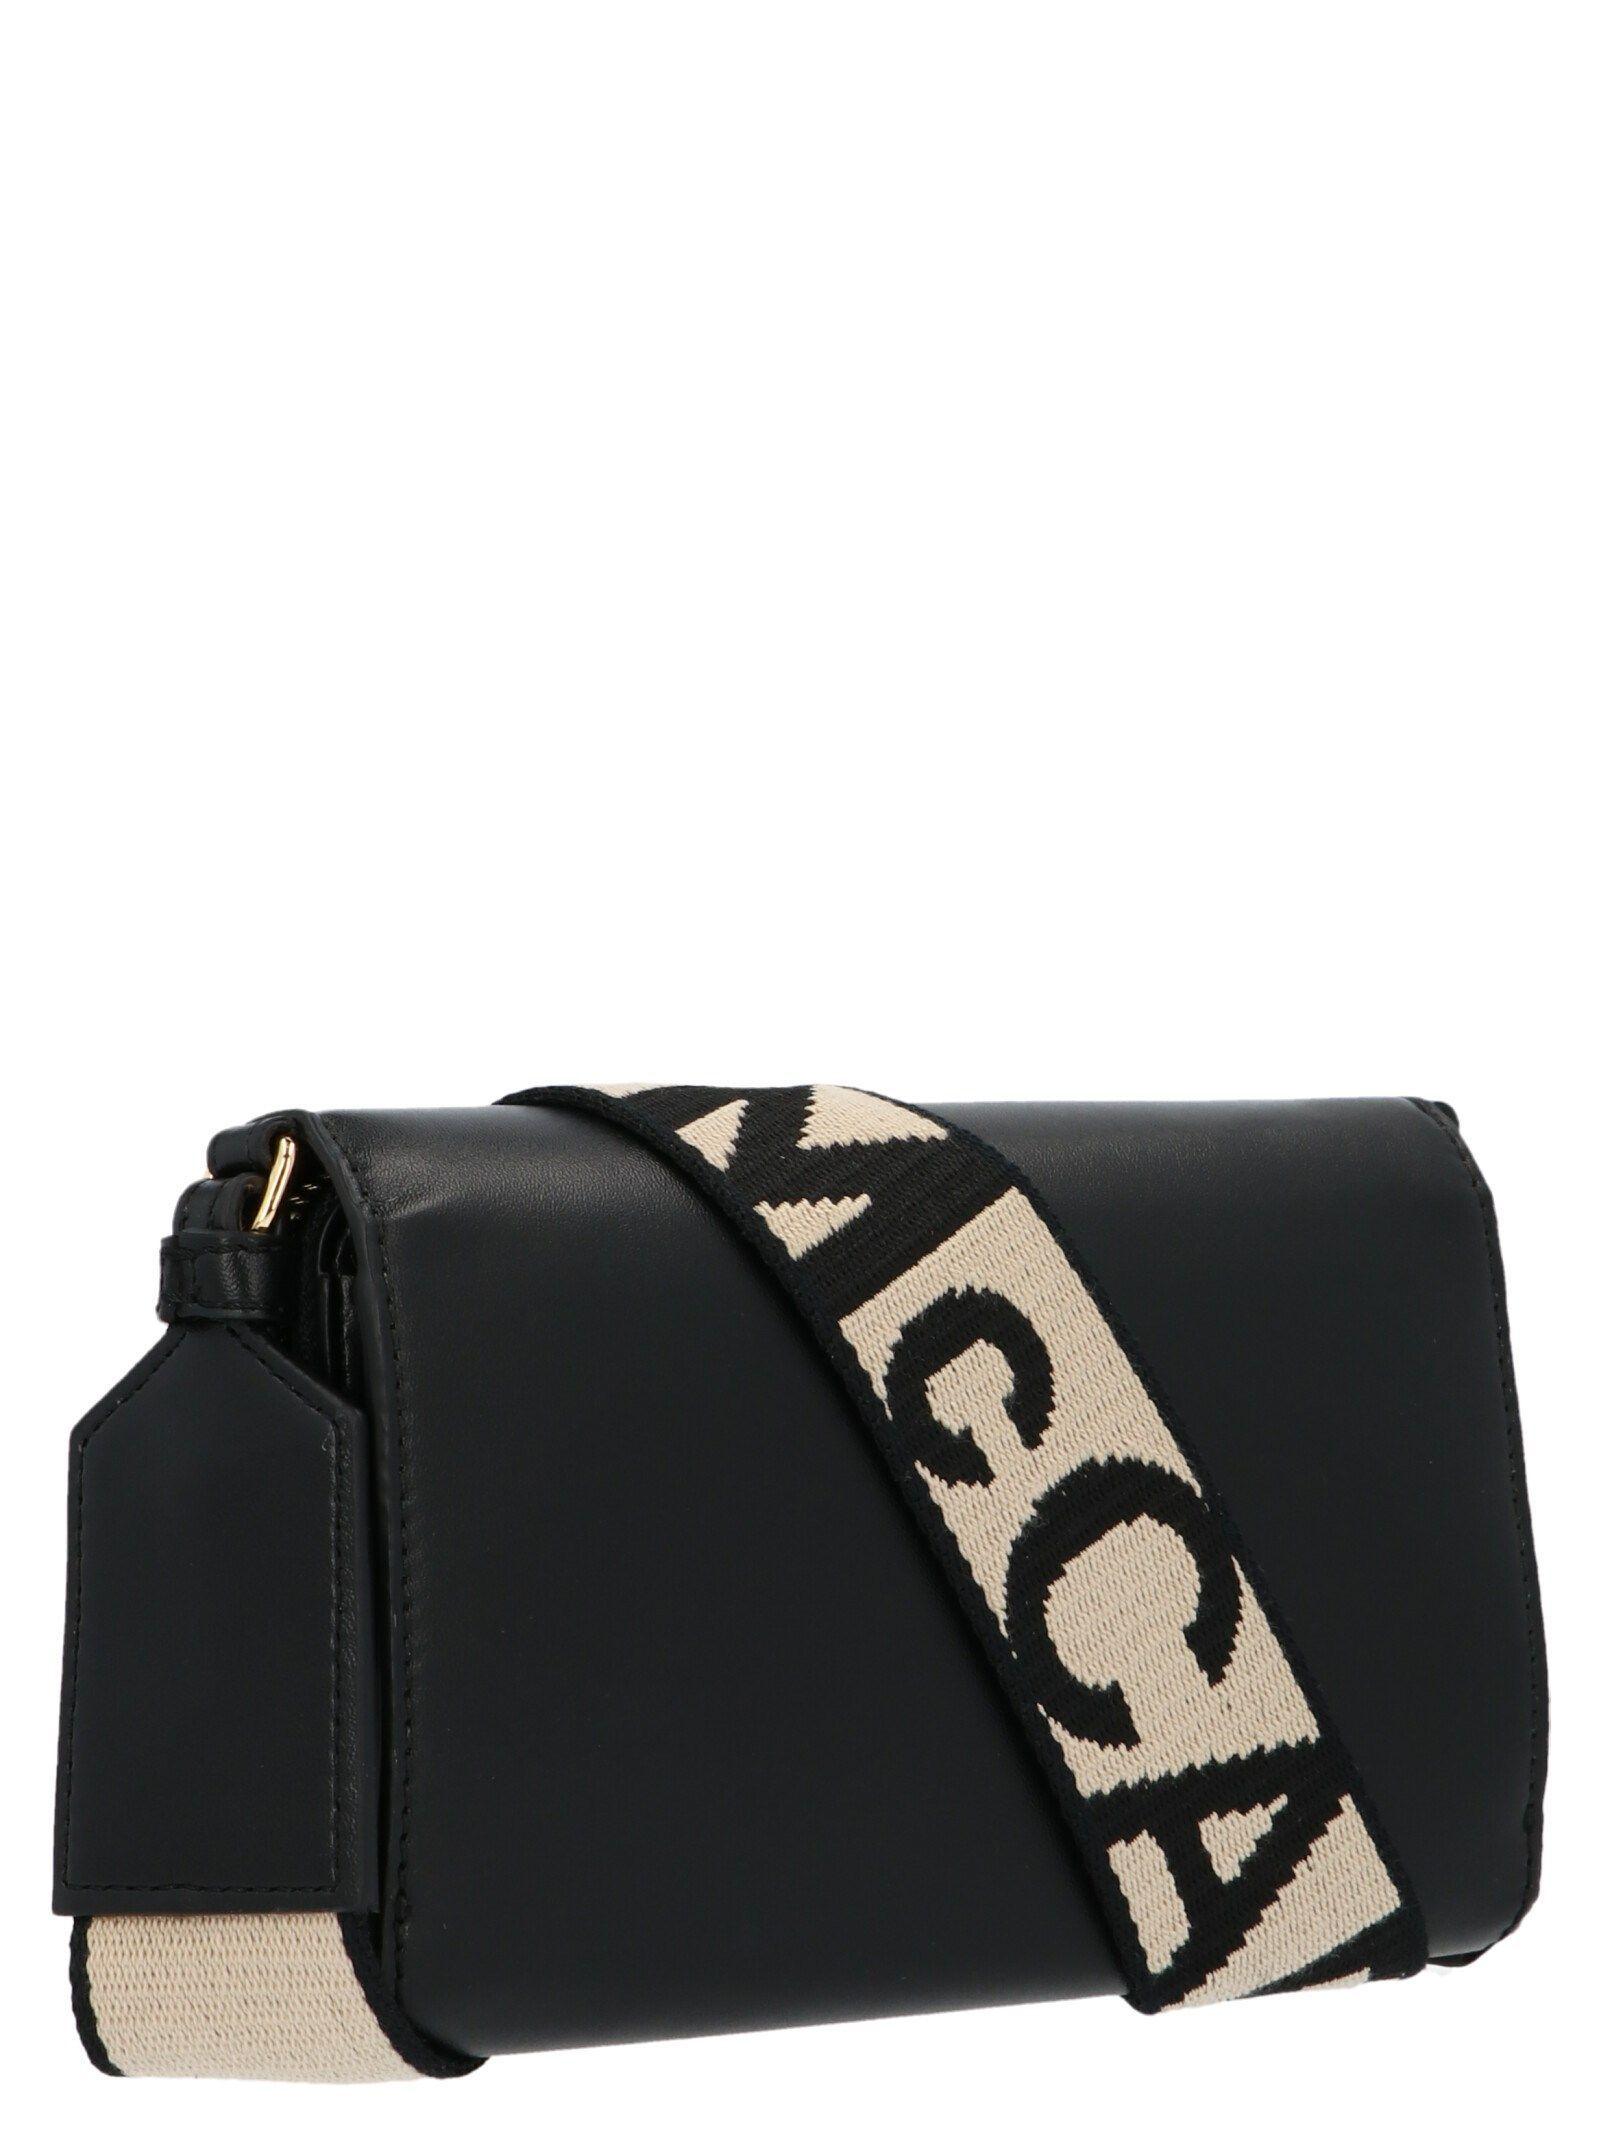 STELLA MCCARTNEY WOMEN'S 700013W85421000 BLACK POLYURETHANE SHOULDER BAG